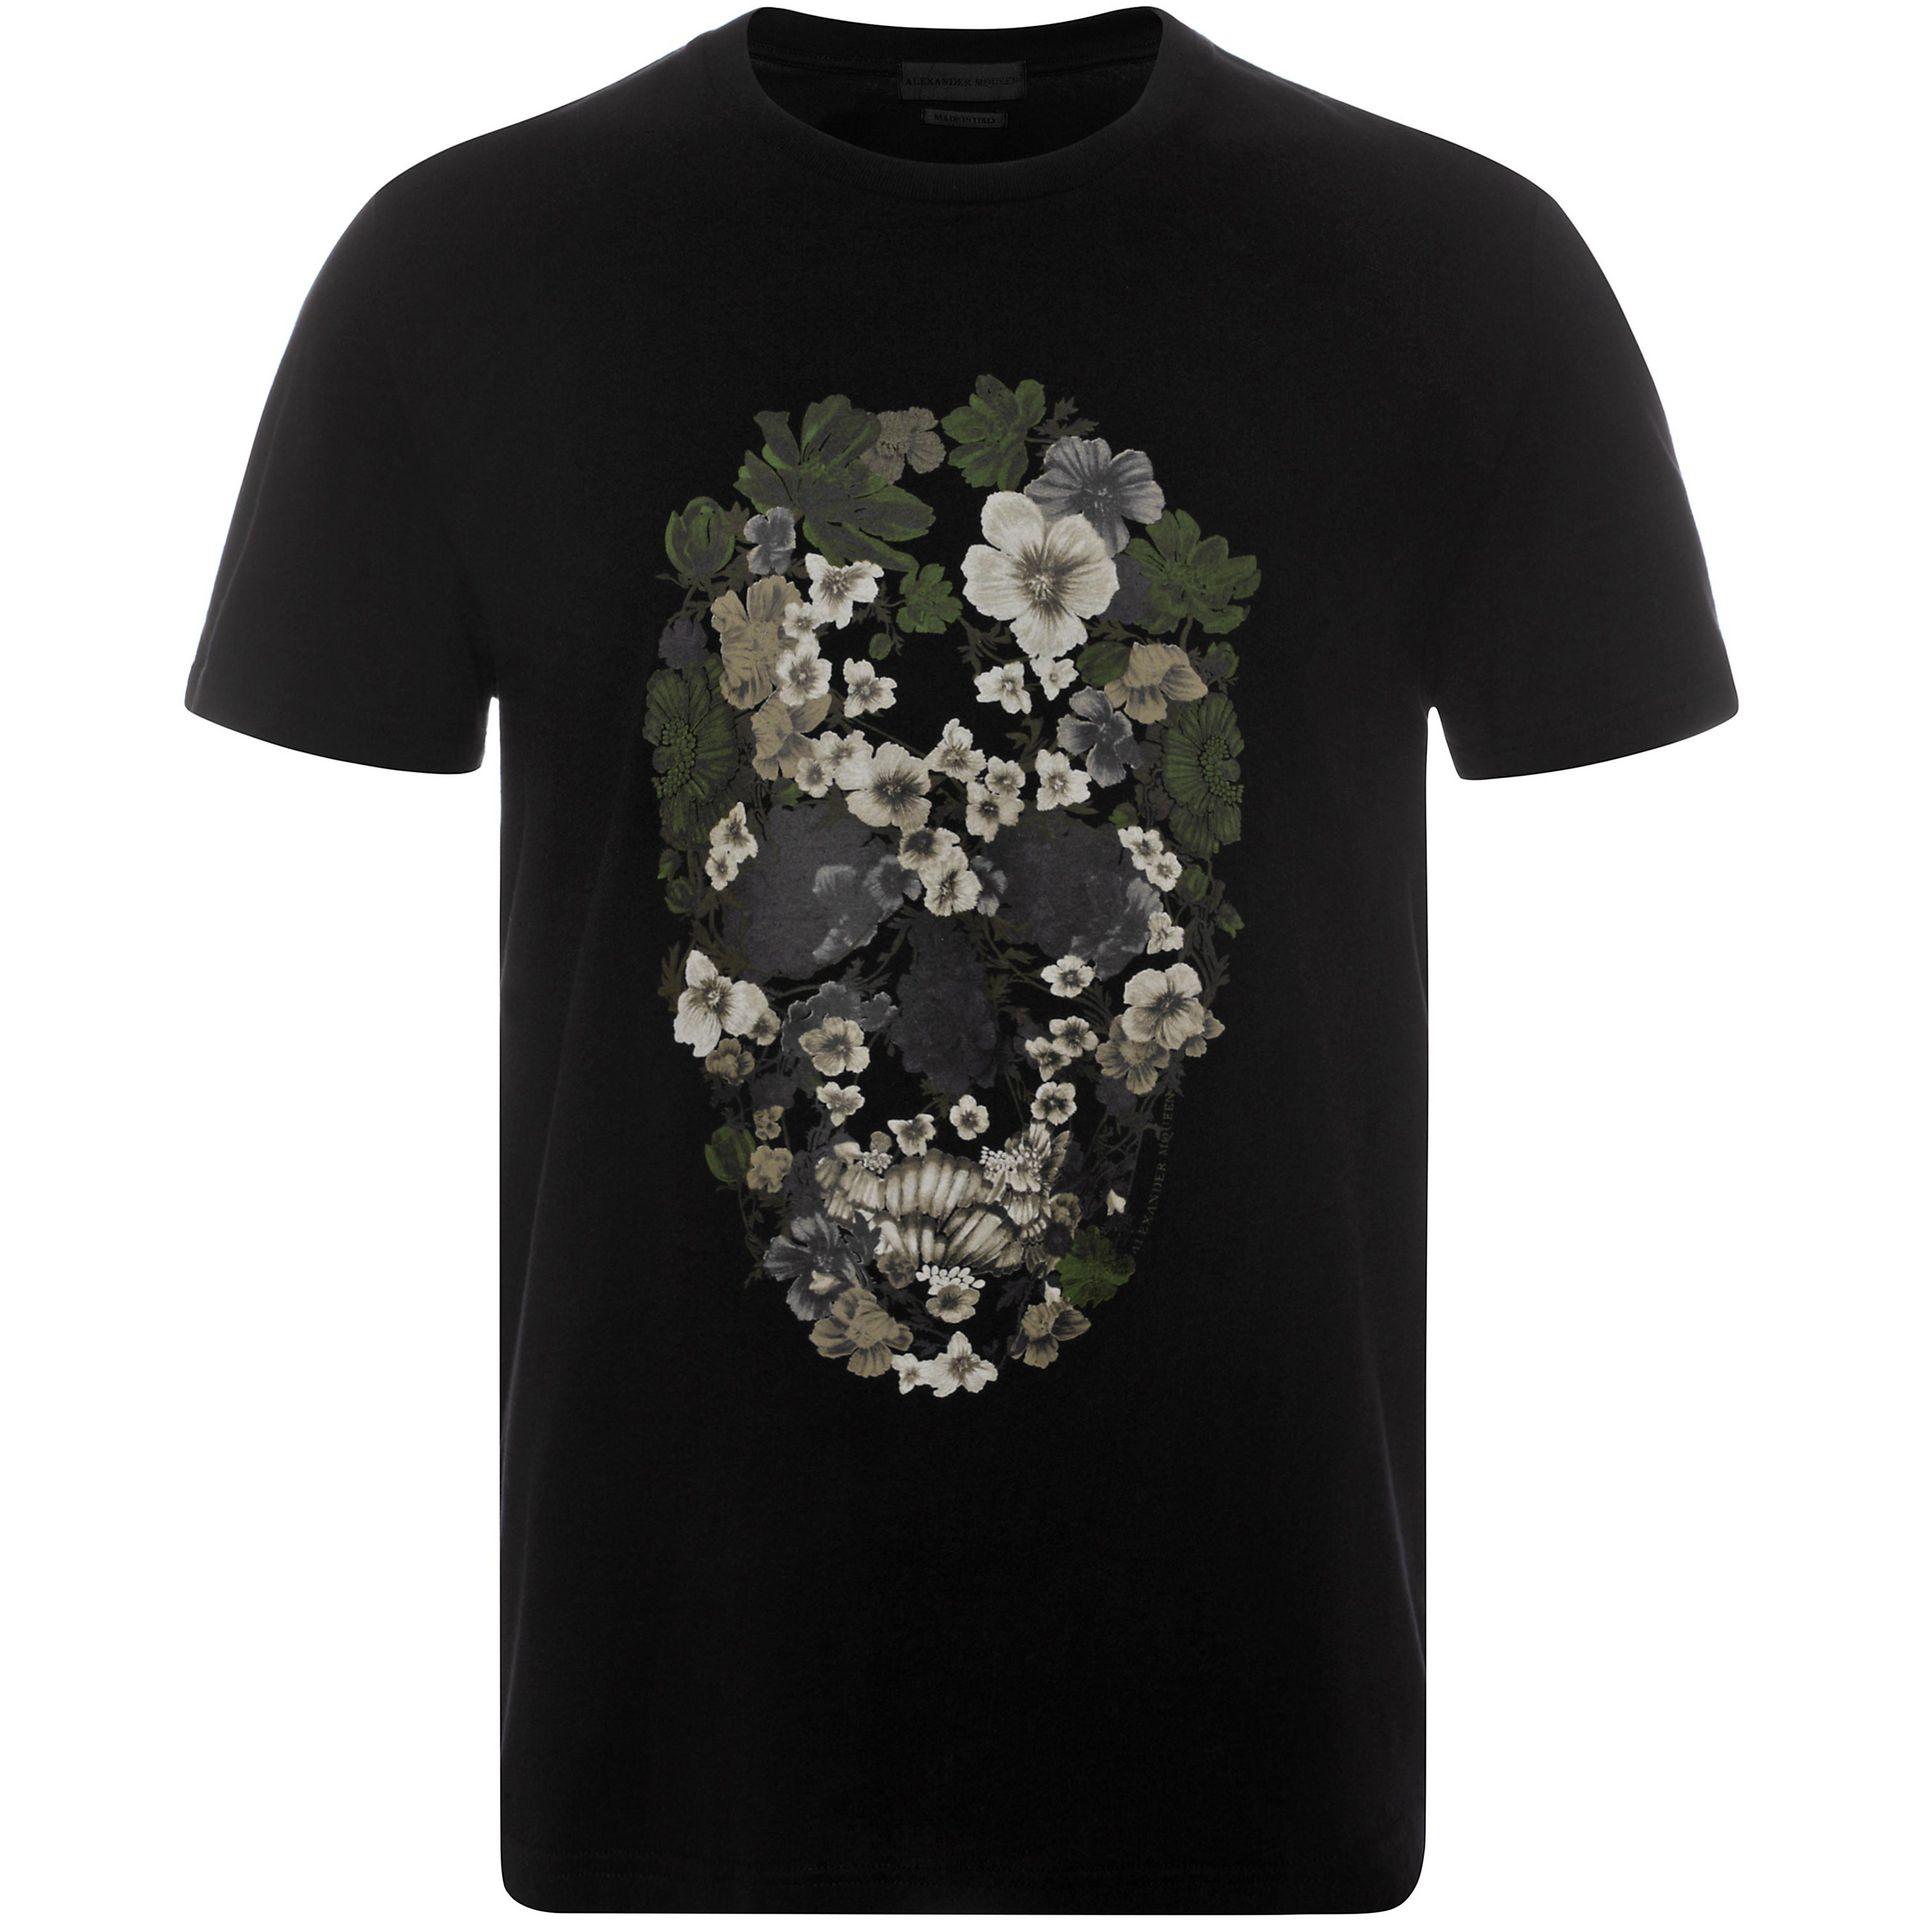 Alexander mcqueen floral skull t shirt in black for men lyst for Alexander mcqueen shirt men